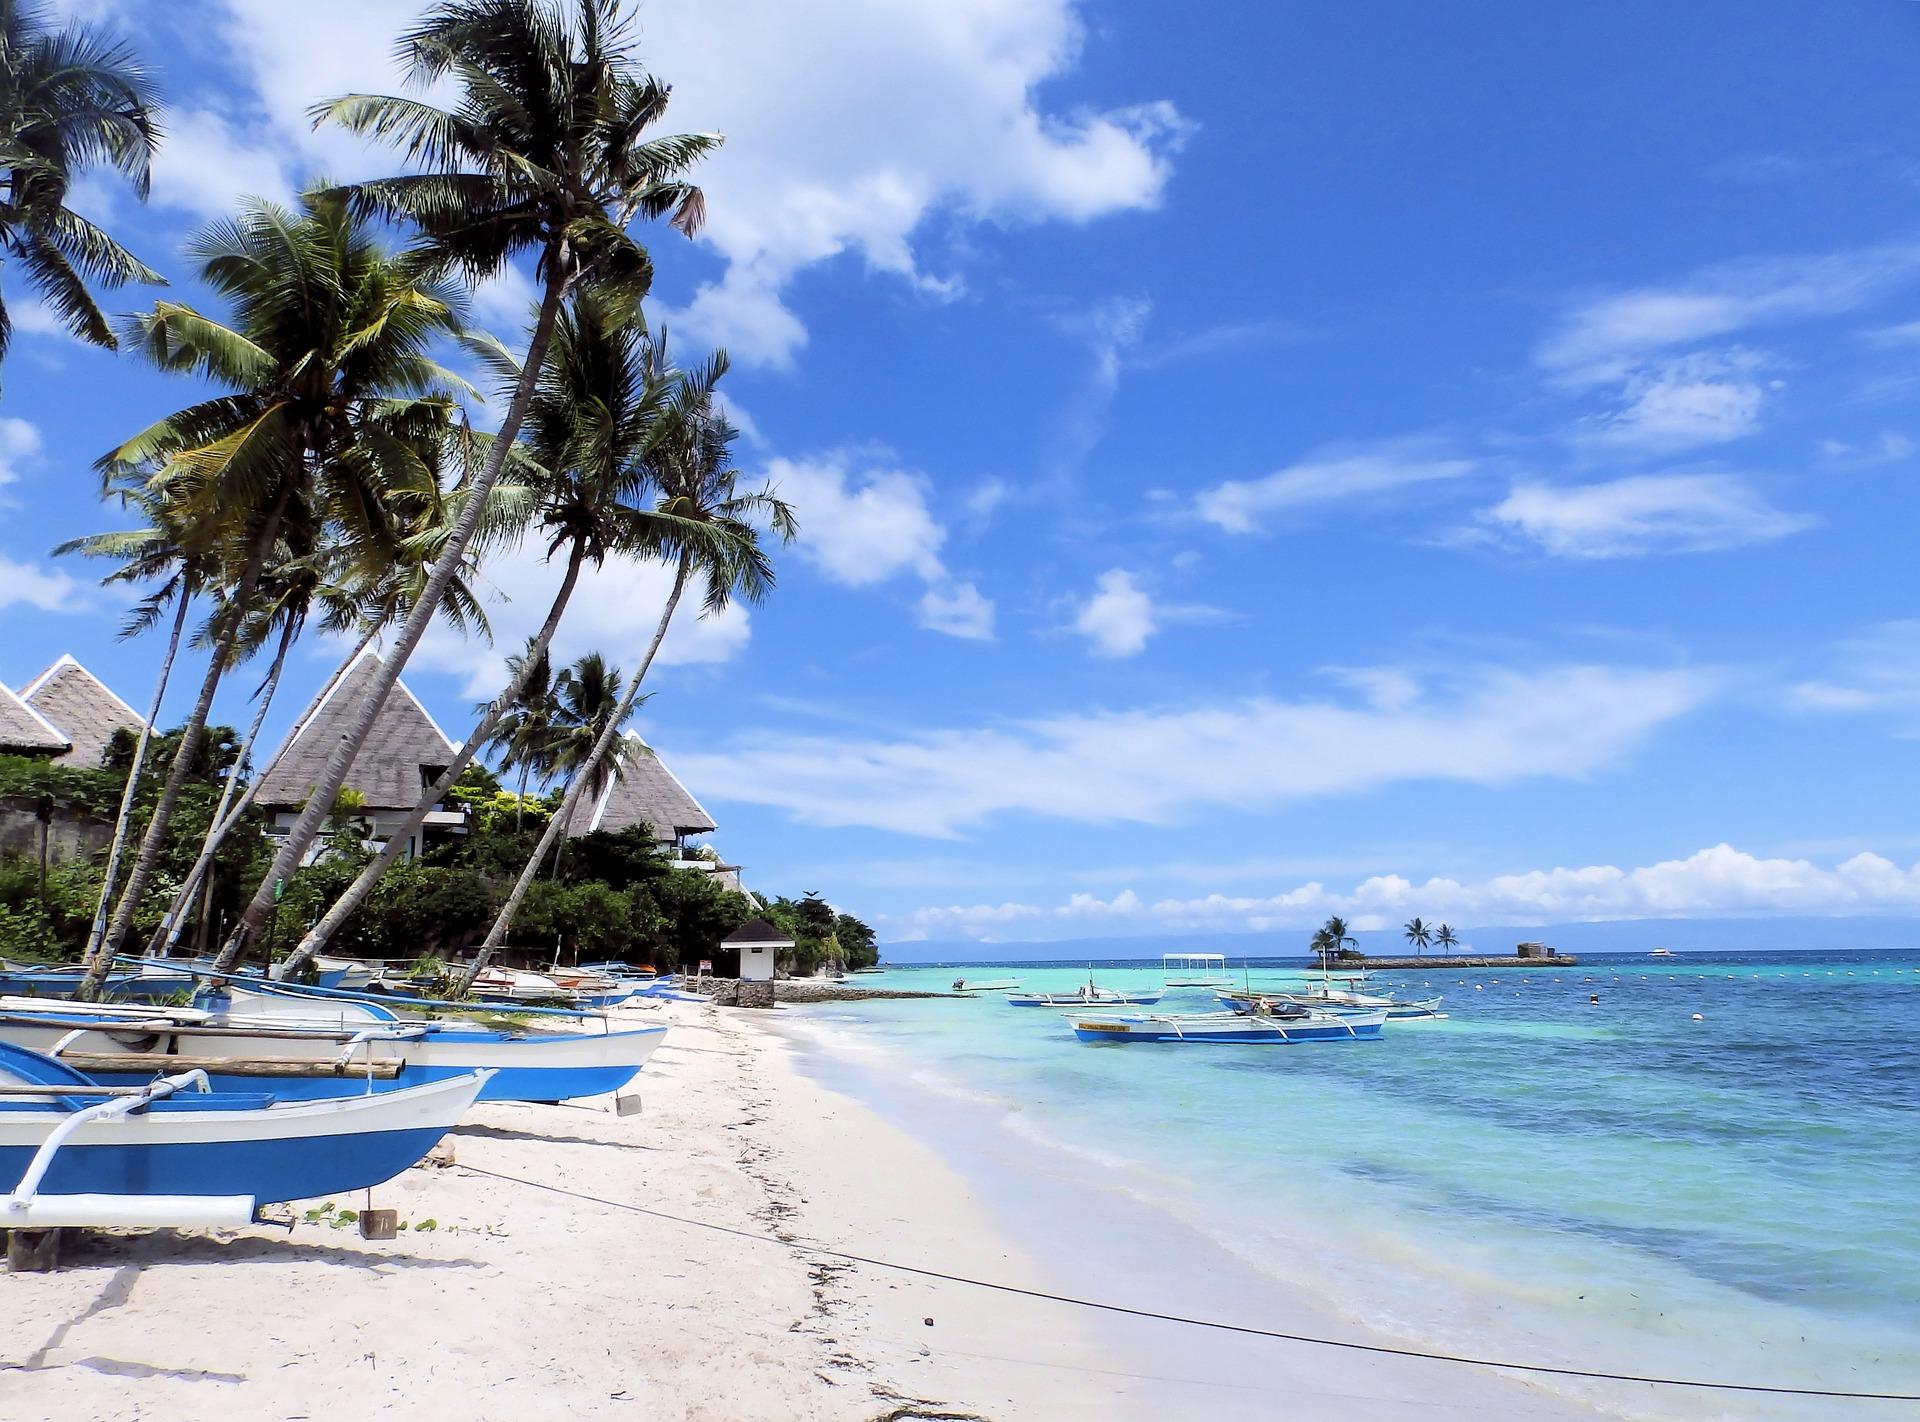 philippines-3606628_1920